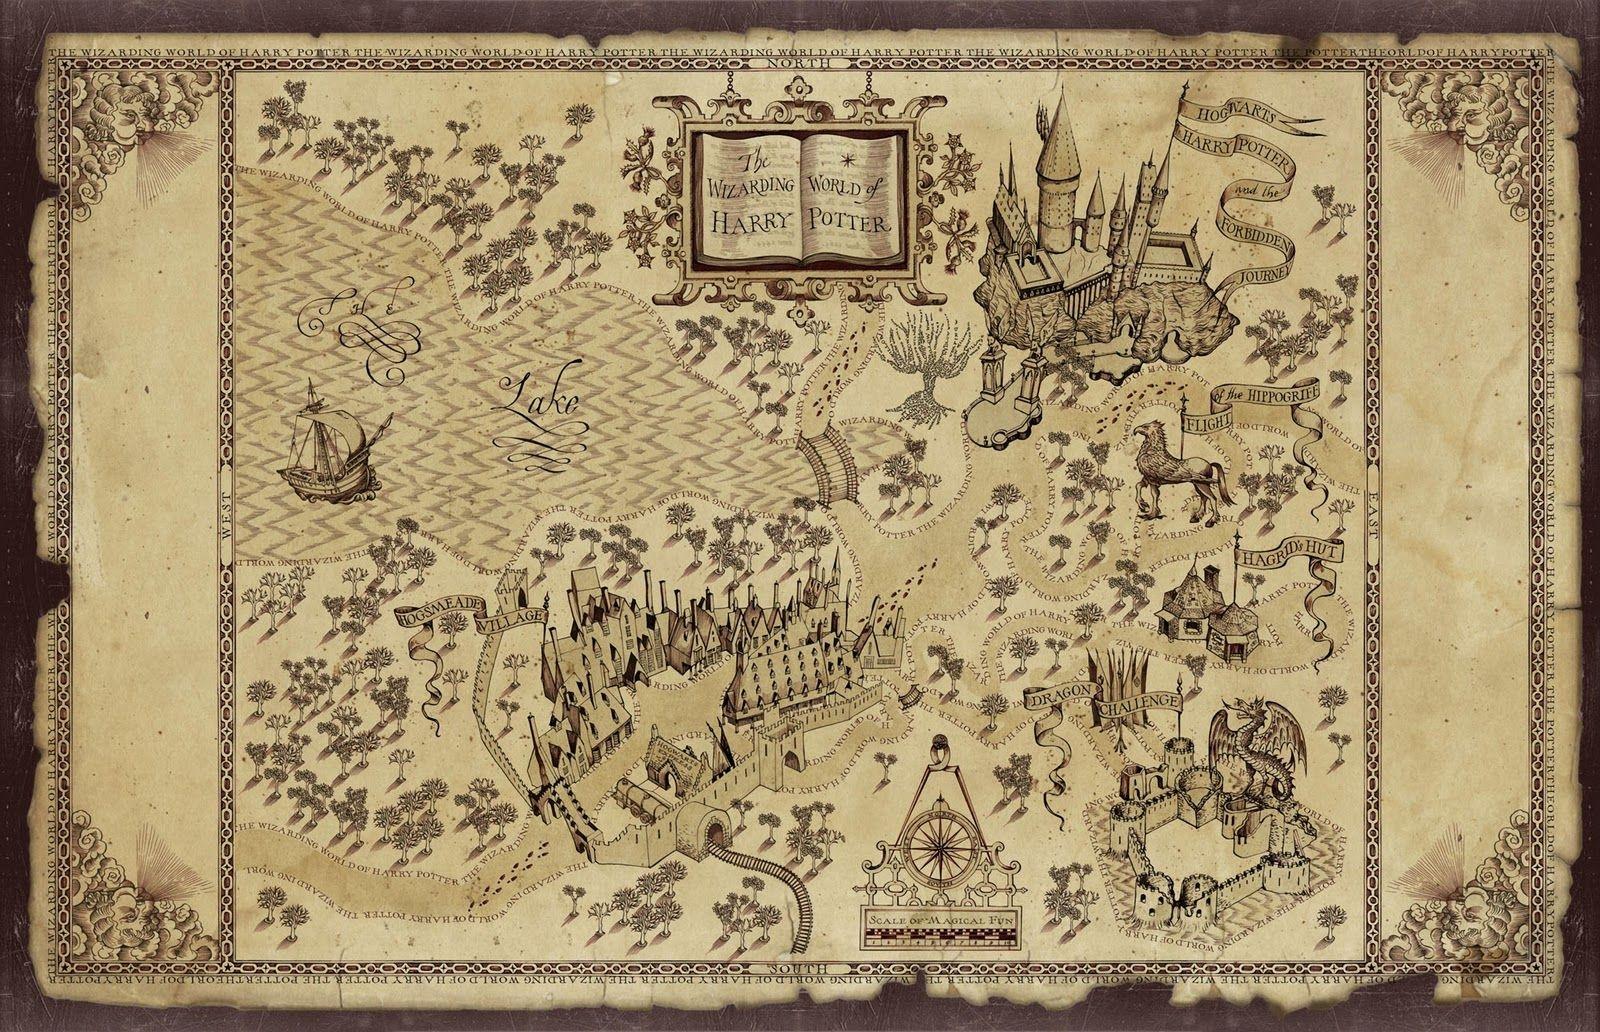 Harry Potter Map | Treasure Map Inspiration | Harry Potter - Free Printable Marauders Map